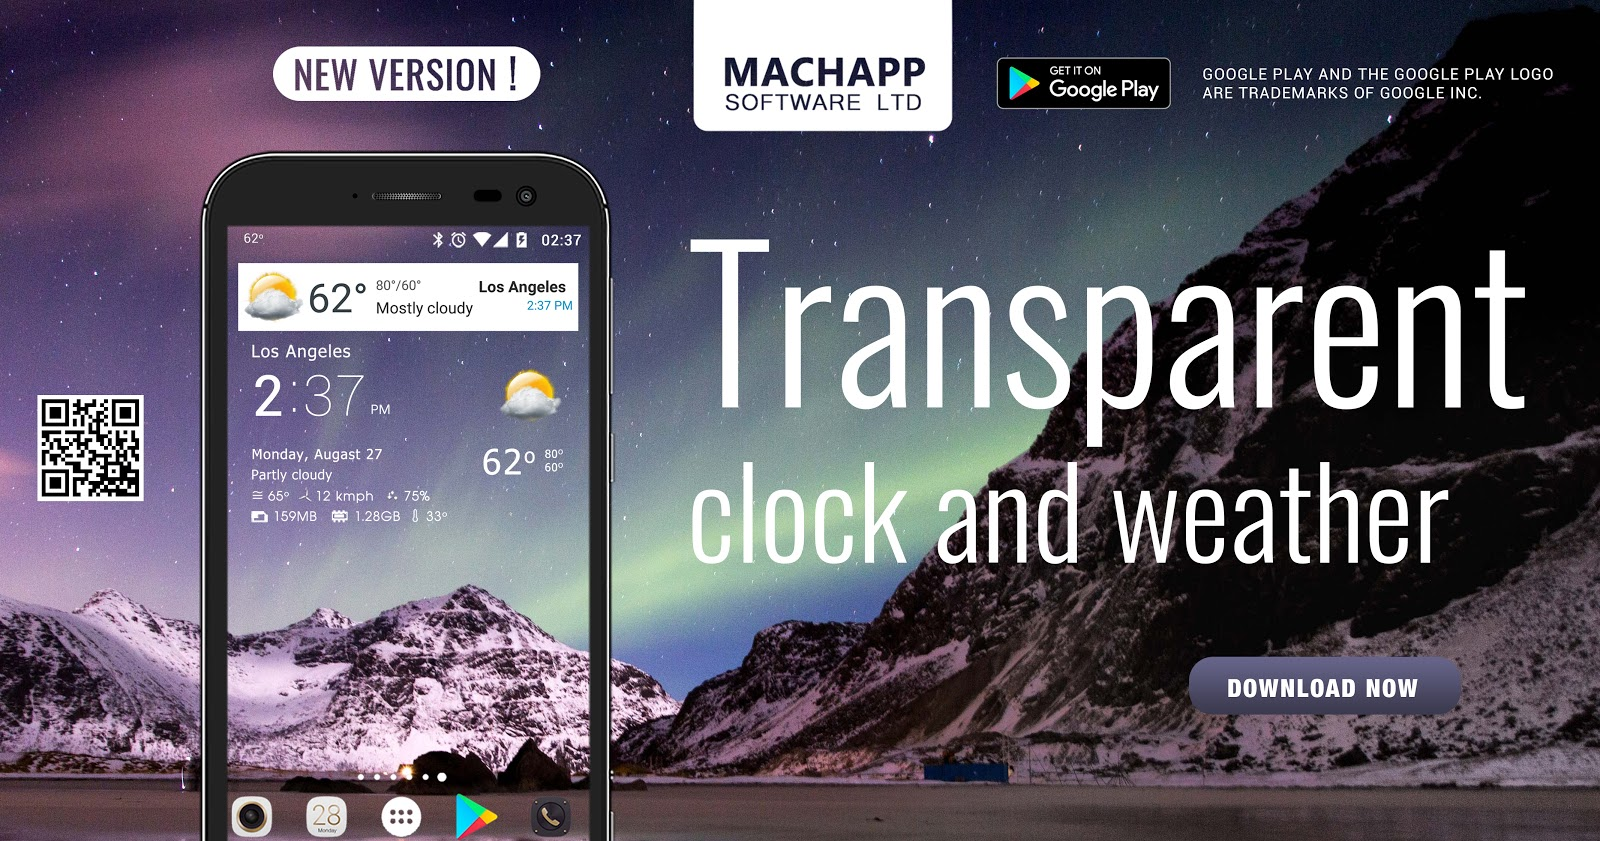 MACHAPP Software Ltd